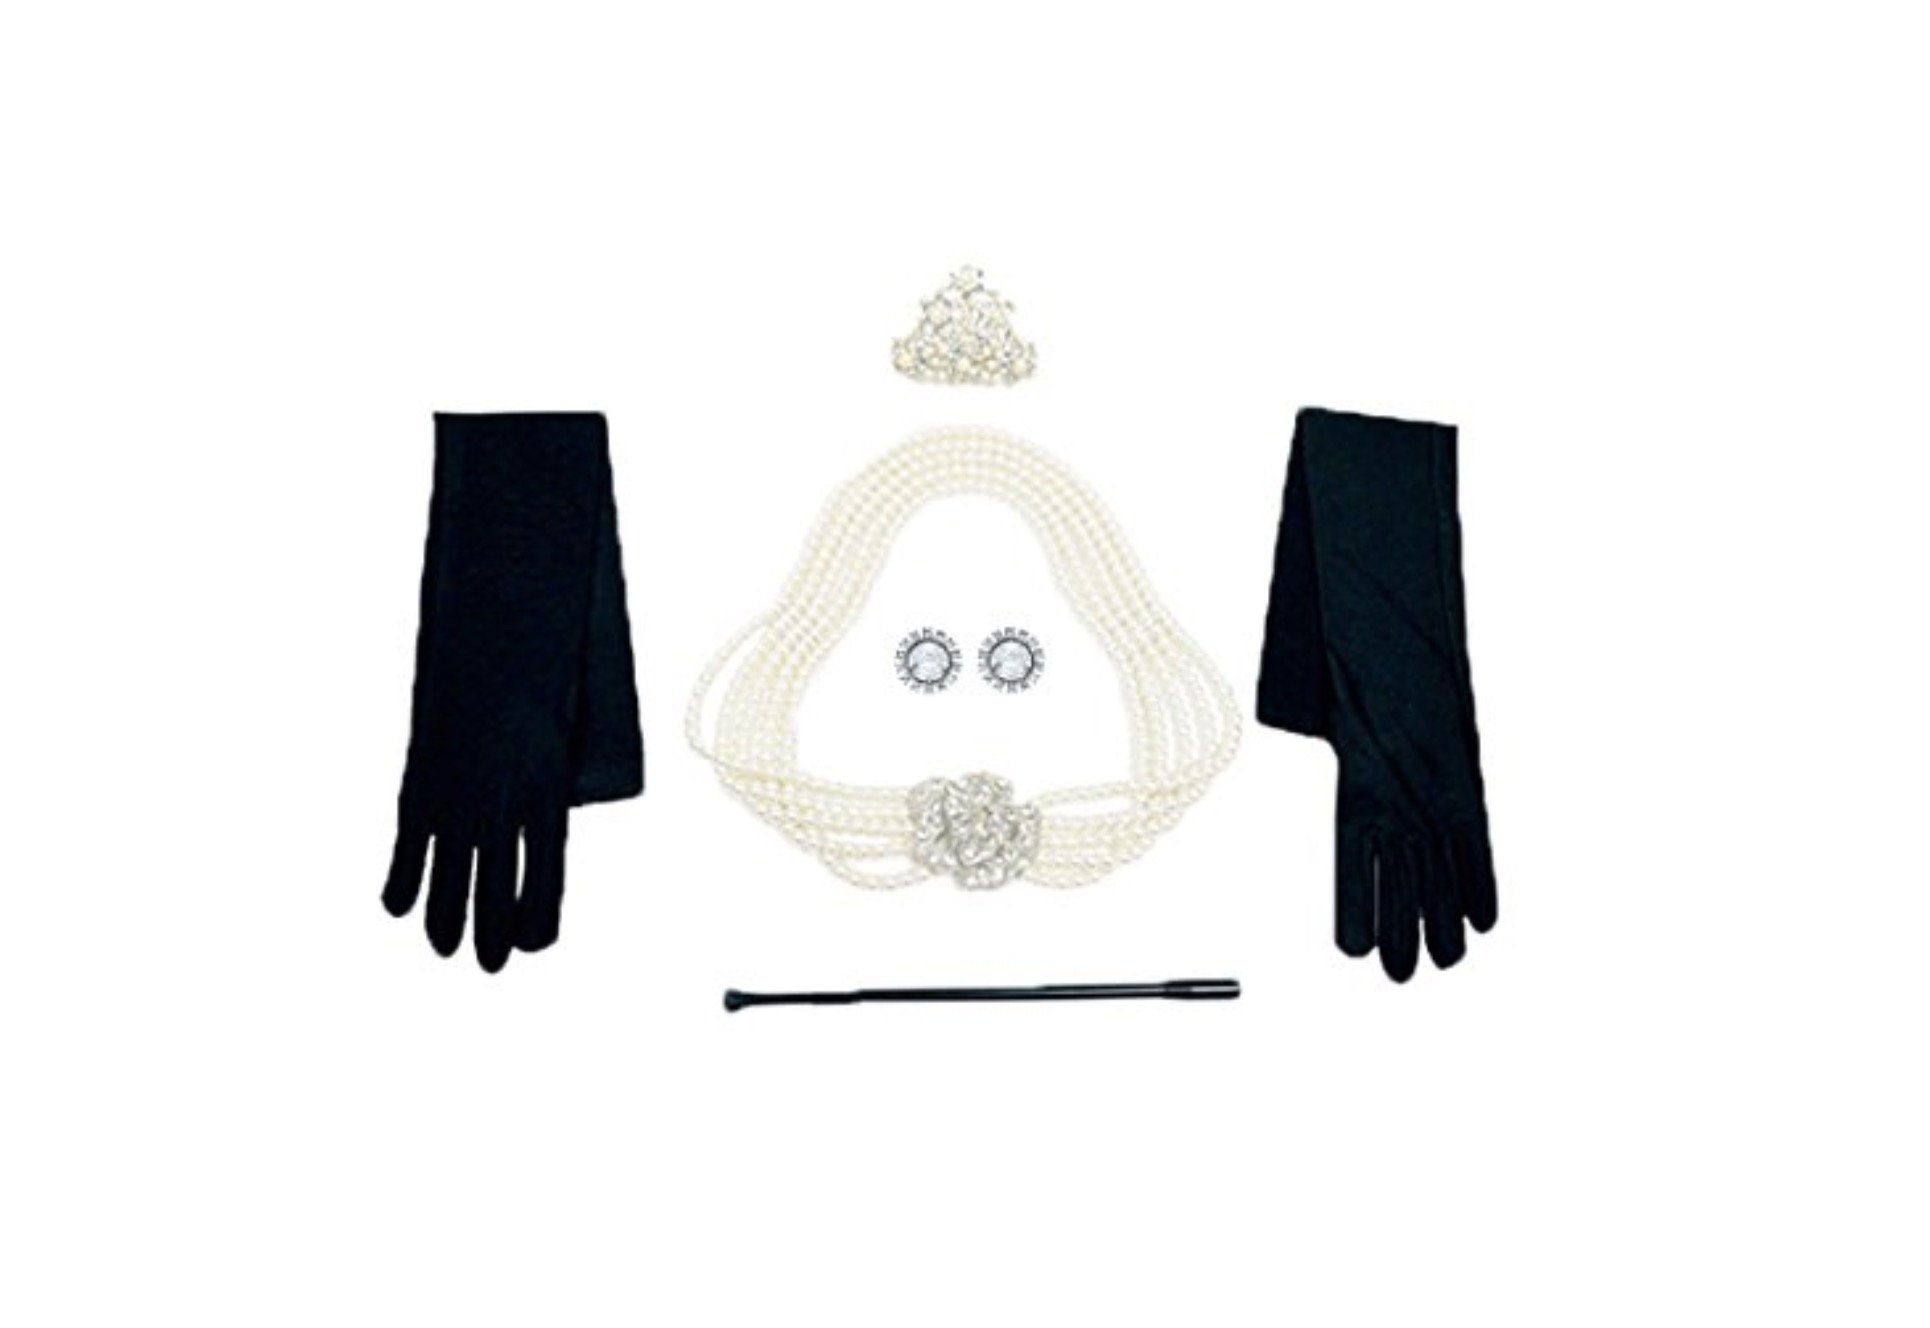 Utopiat Costume Jewelry and Accessory Set, Audrey Hepburn, Breakfast at Tiffany's